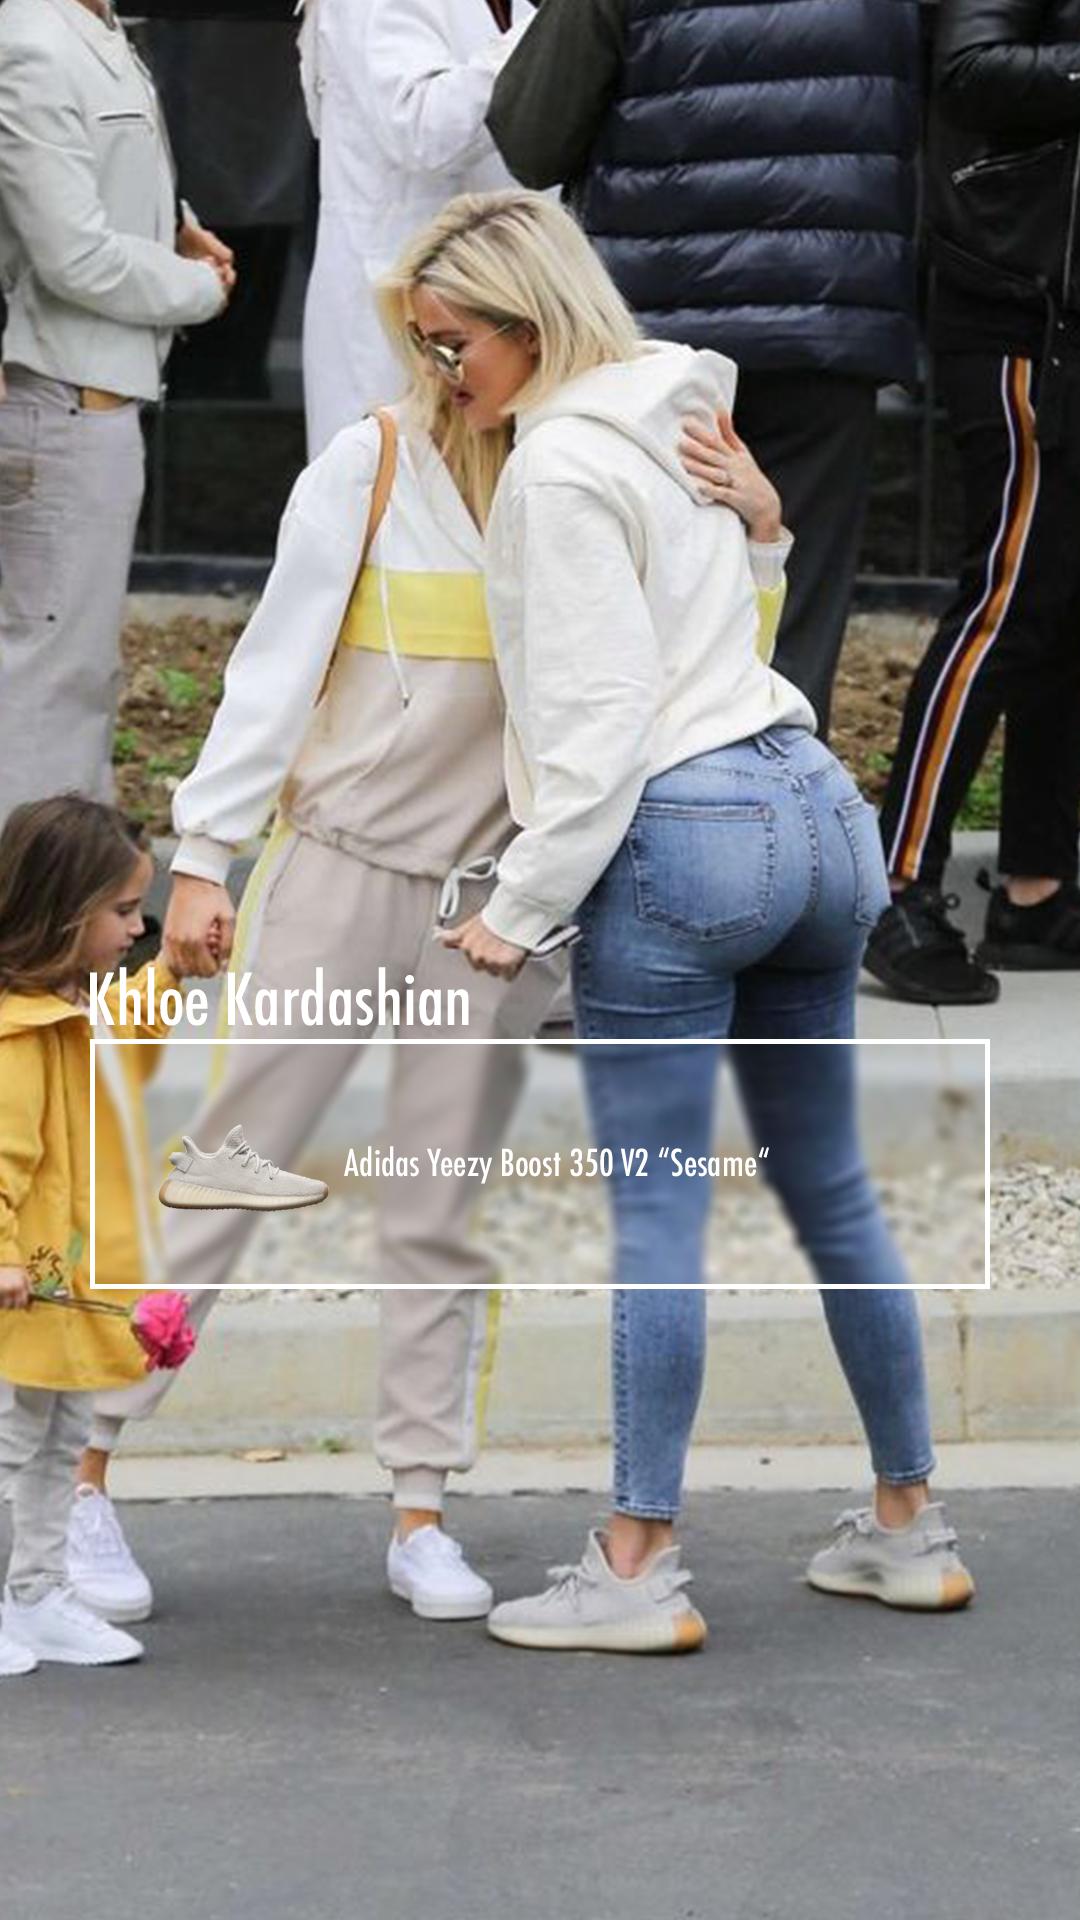 Sesame Yeezy Outfit : sesame, yeezy, outfit, Khloe, Kardashian:, Adidas, Yeezy, Boost,